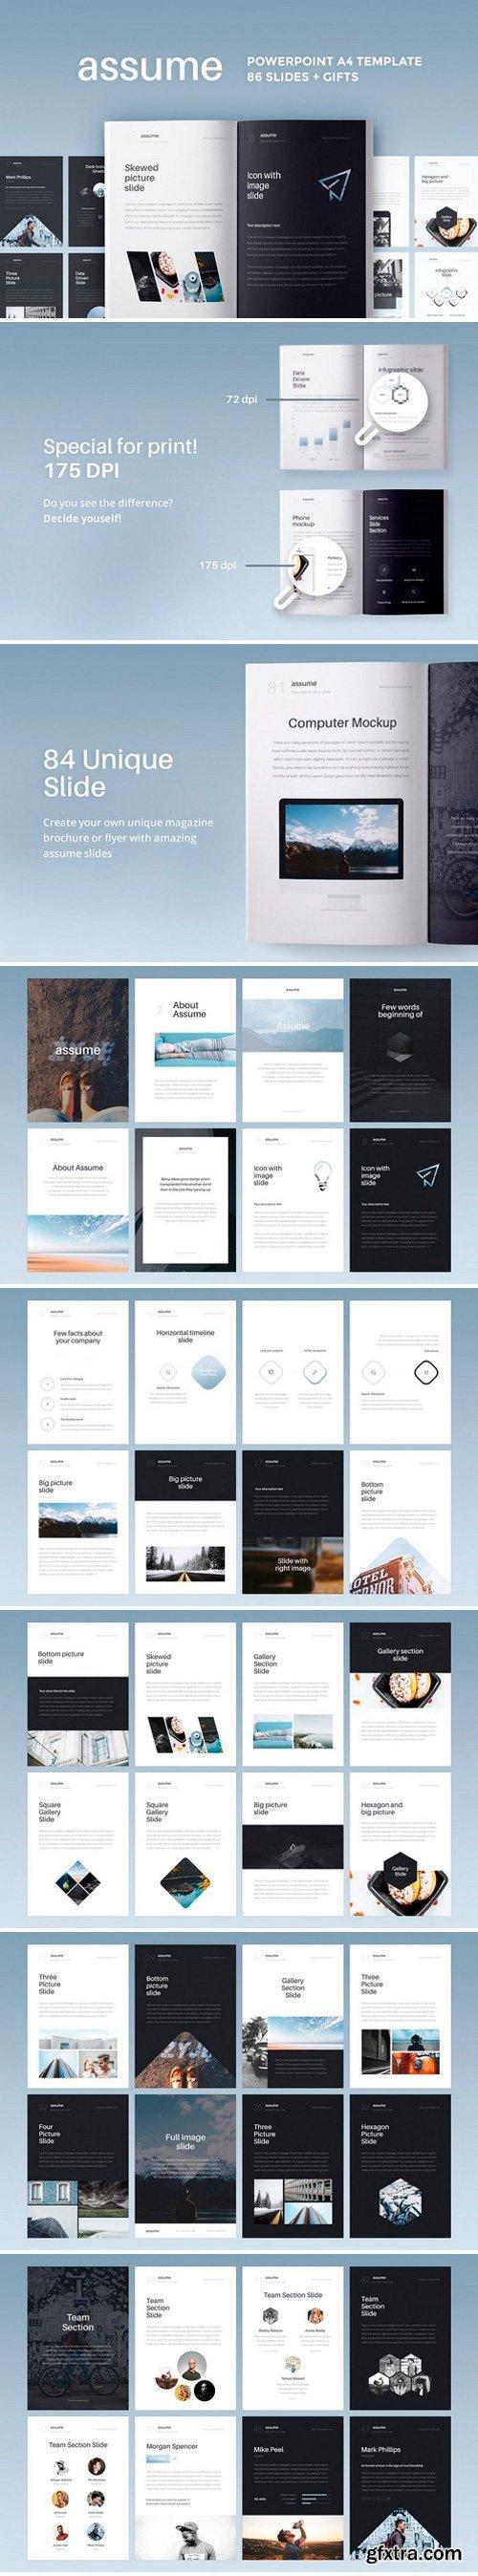 CM - A4 | Assume PowerPoint Template 1425782